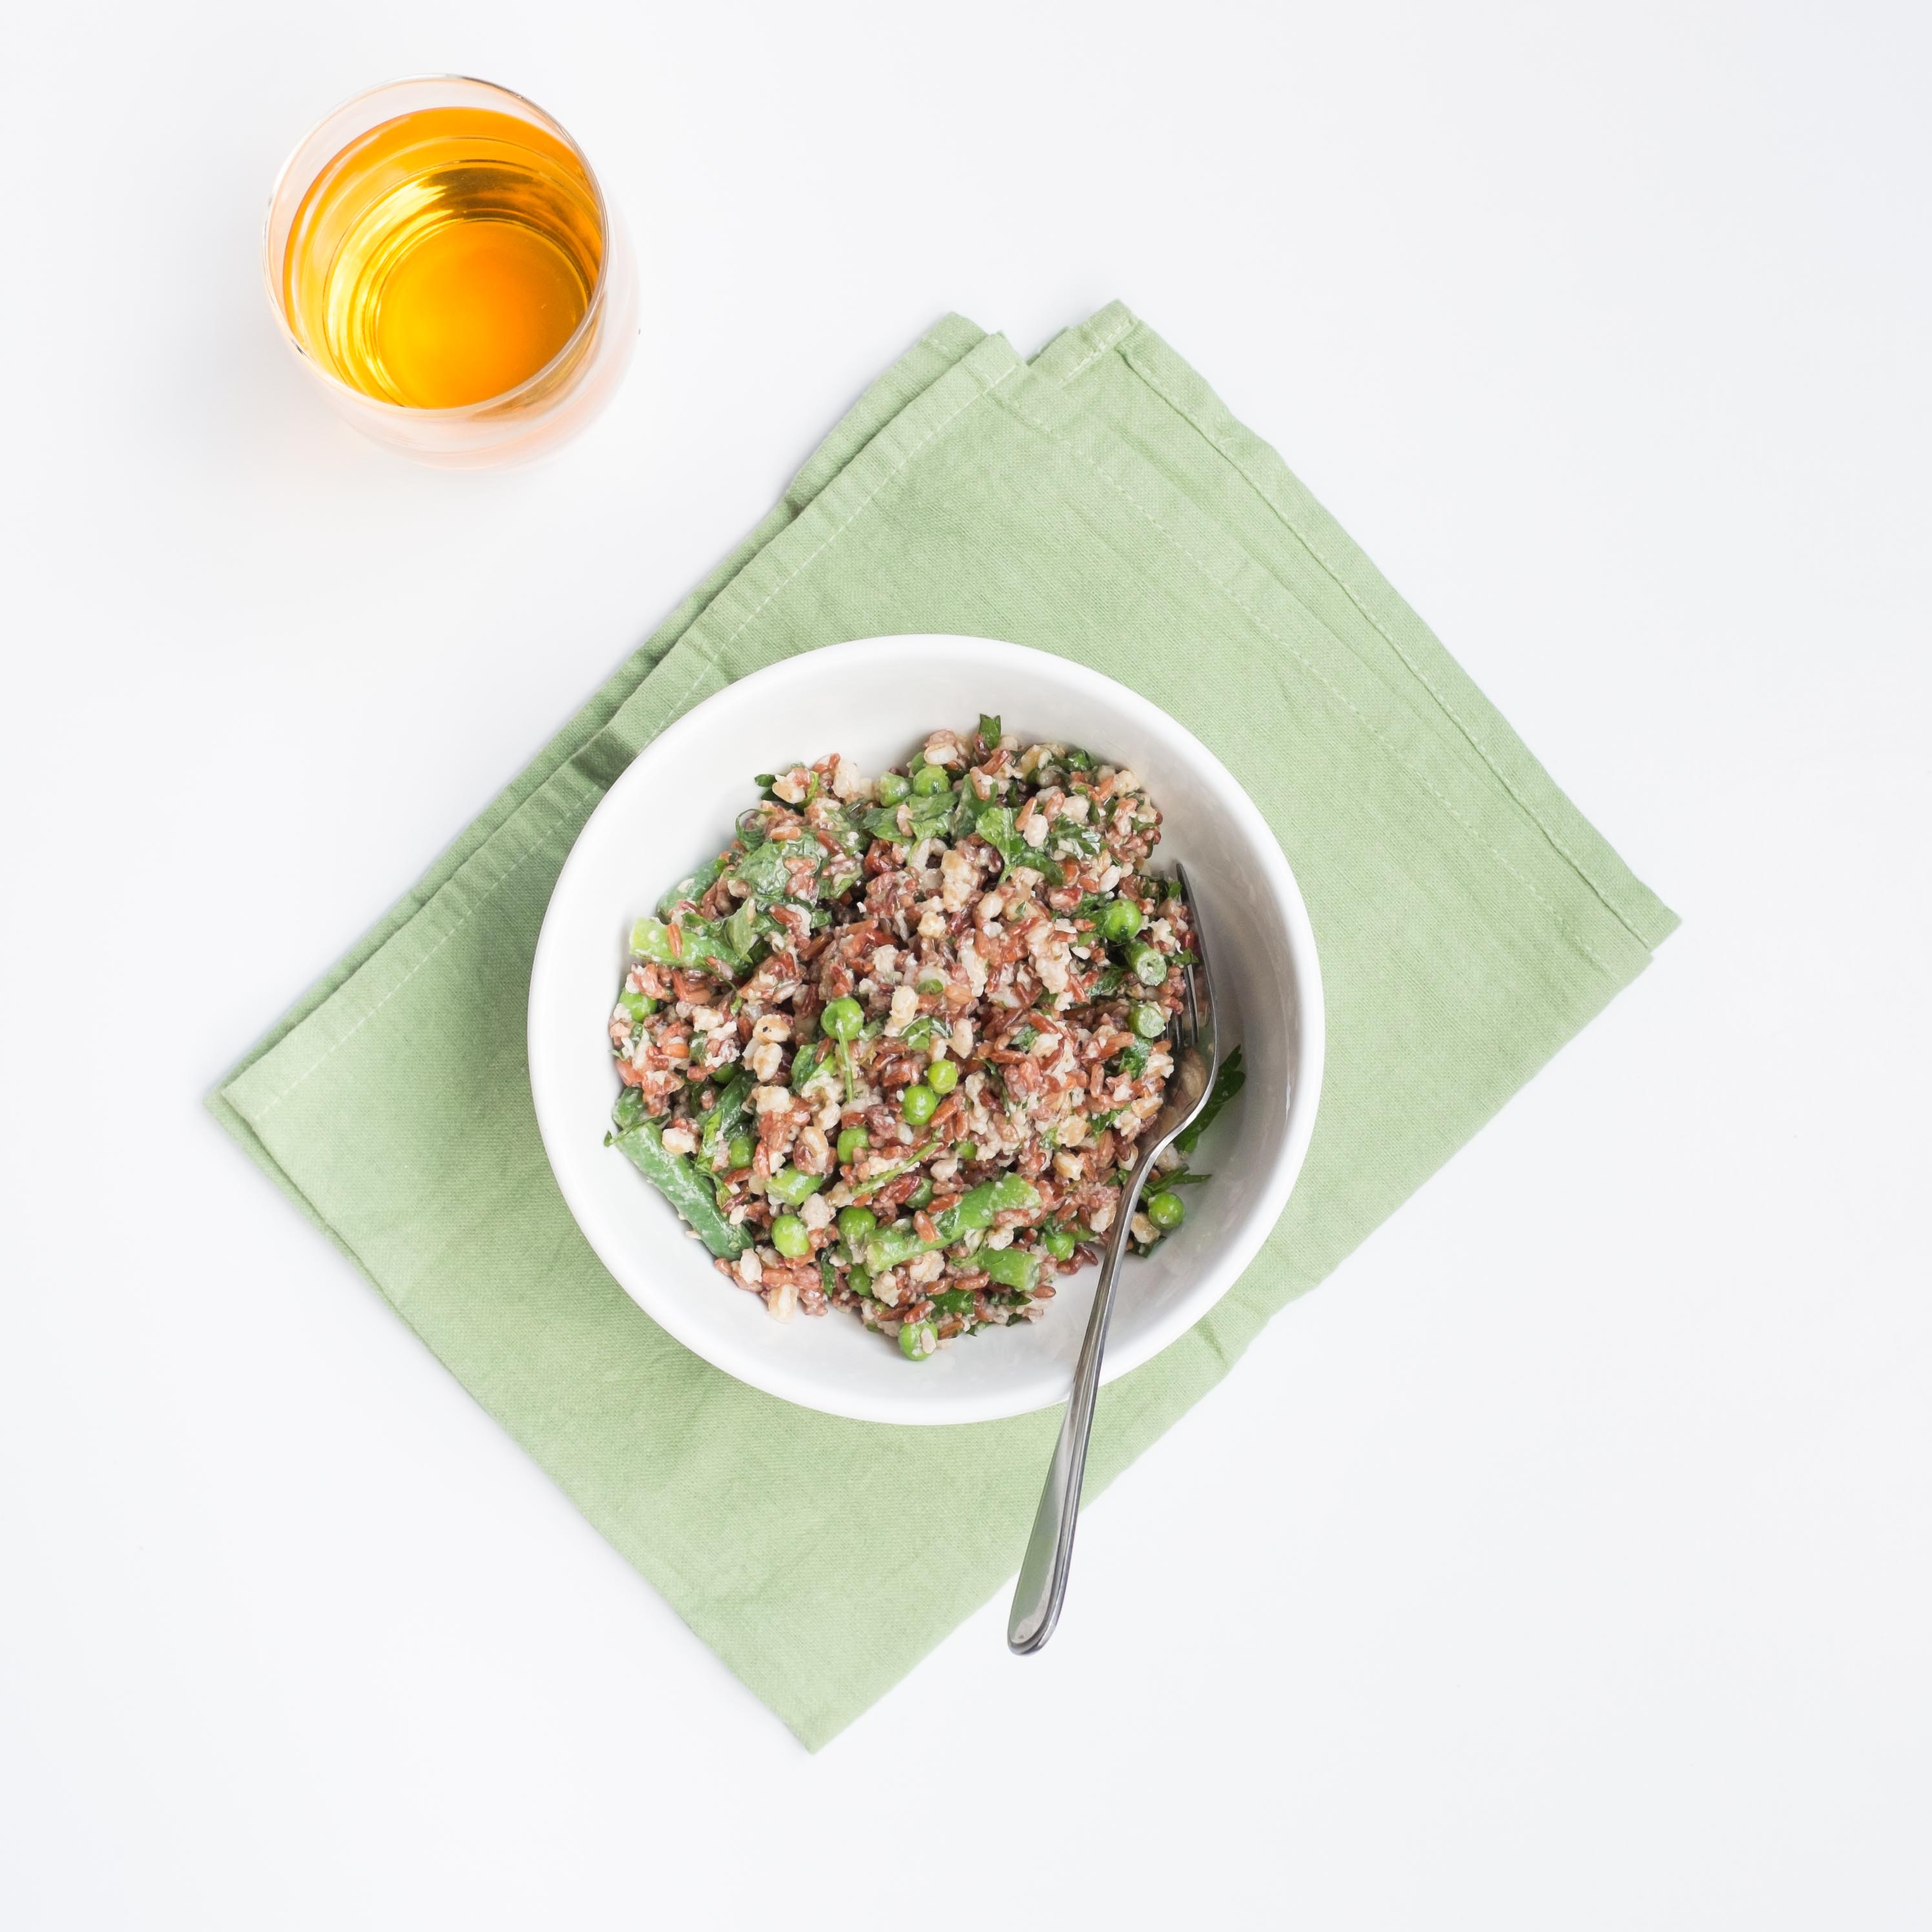 20170616 Salad Vegetarian 1